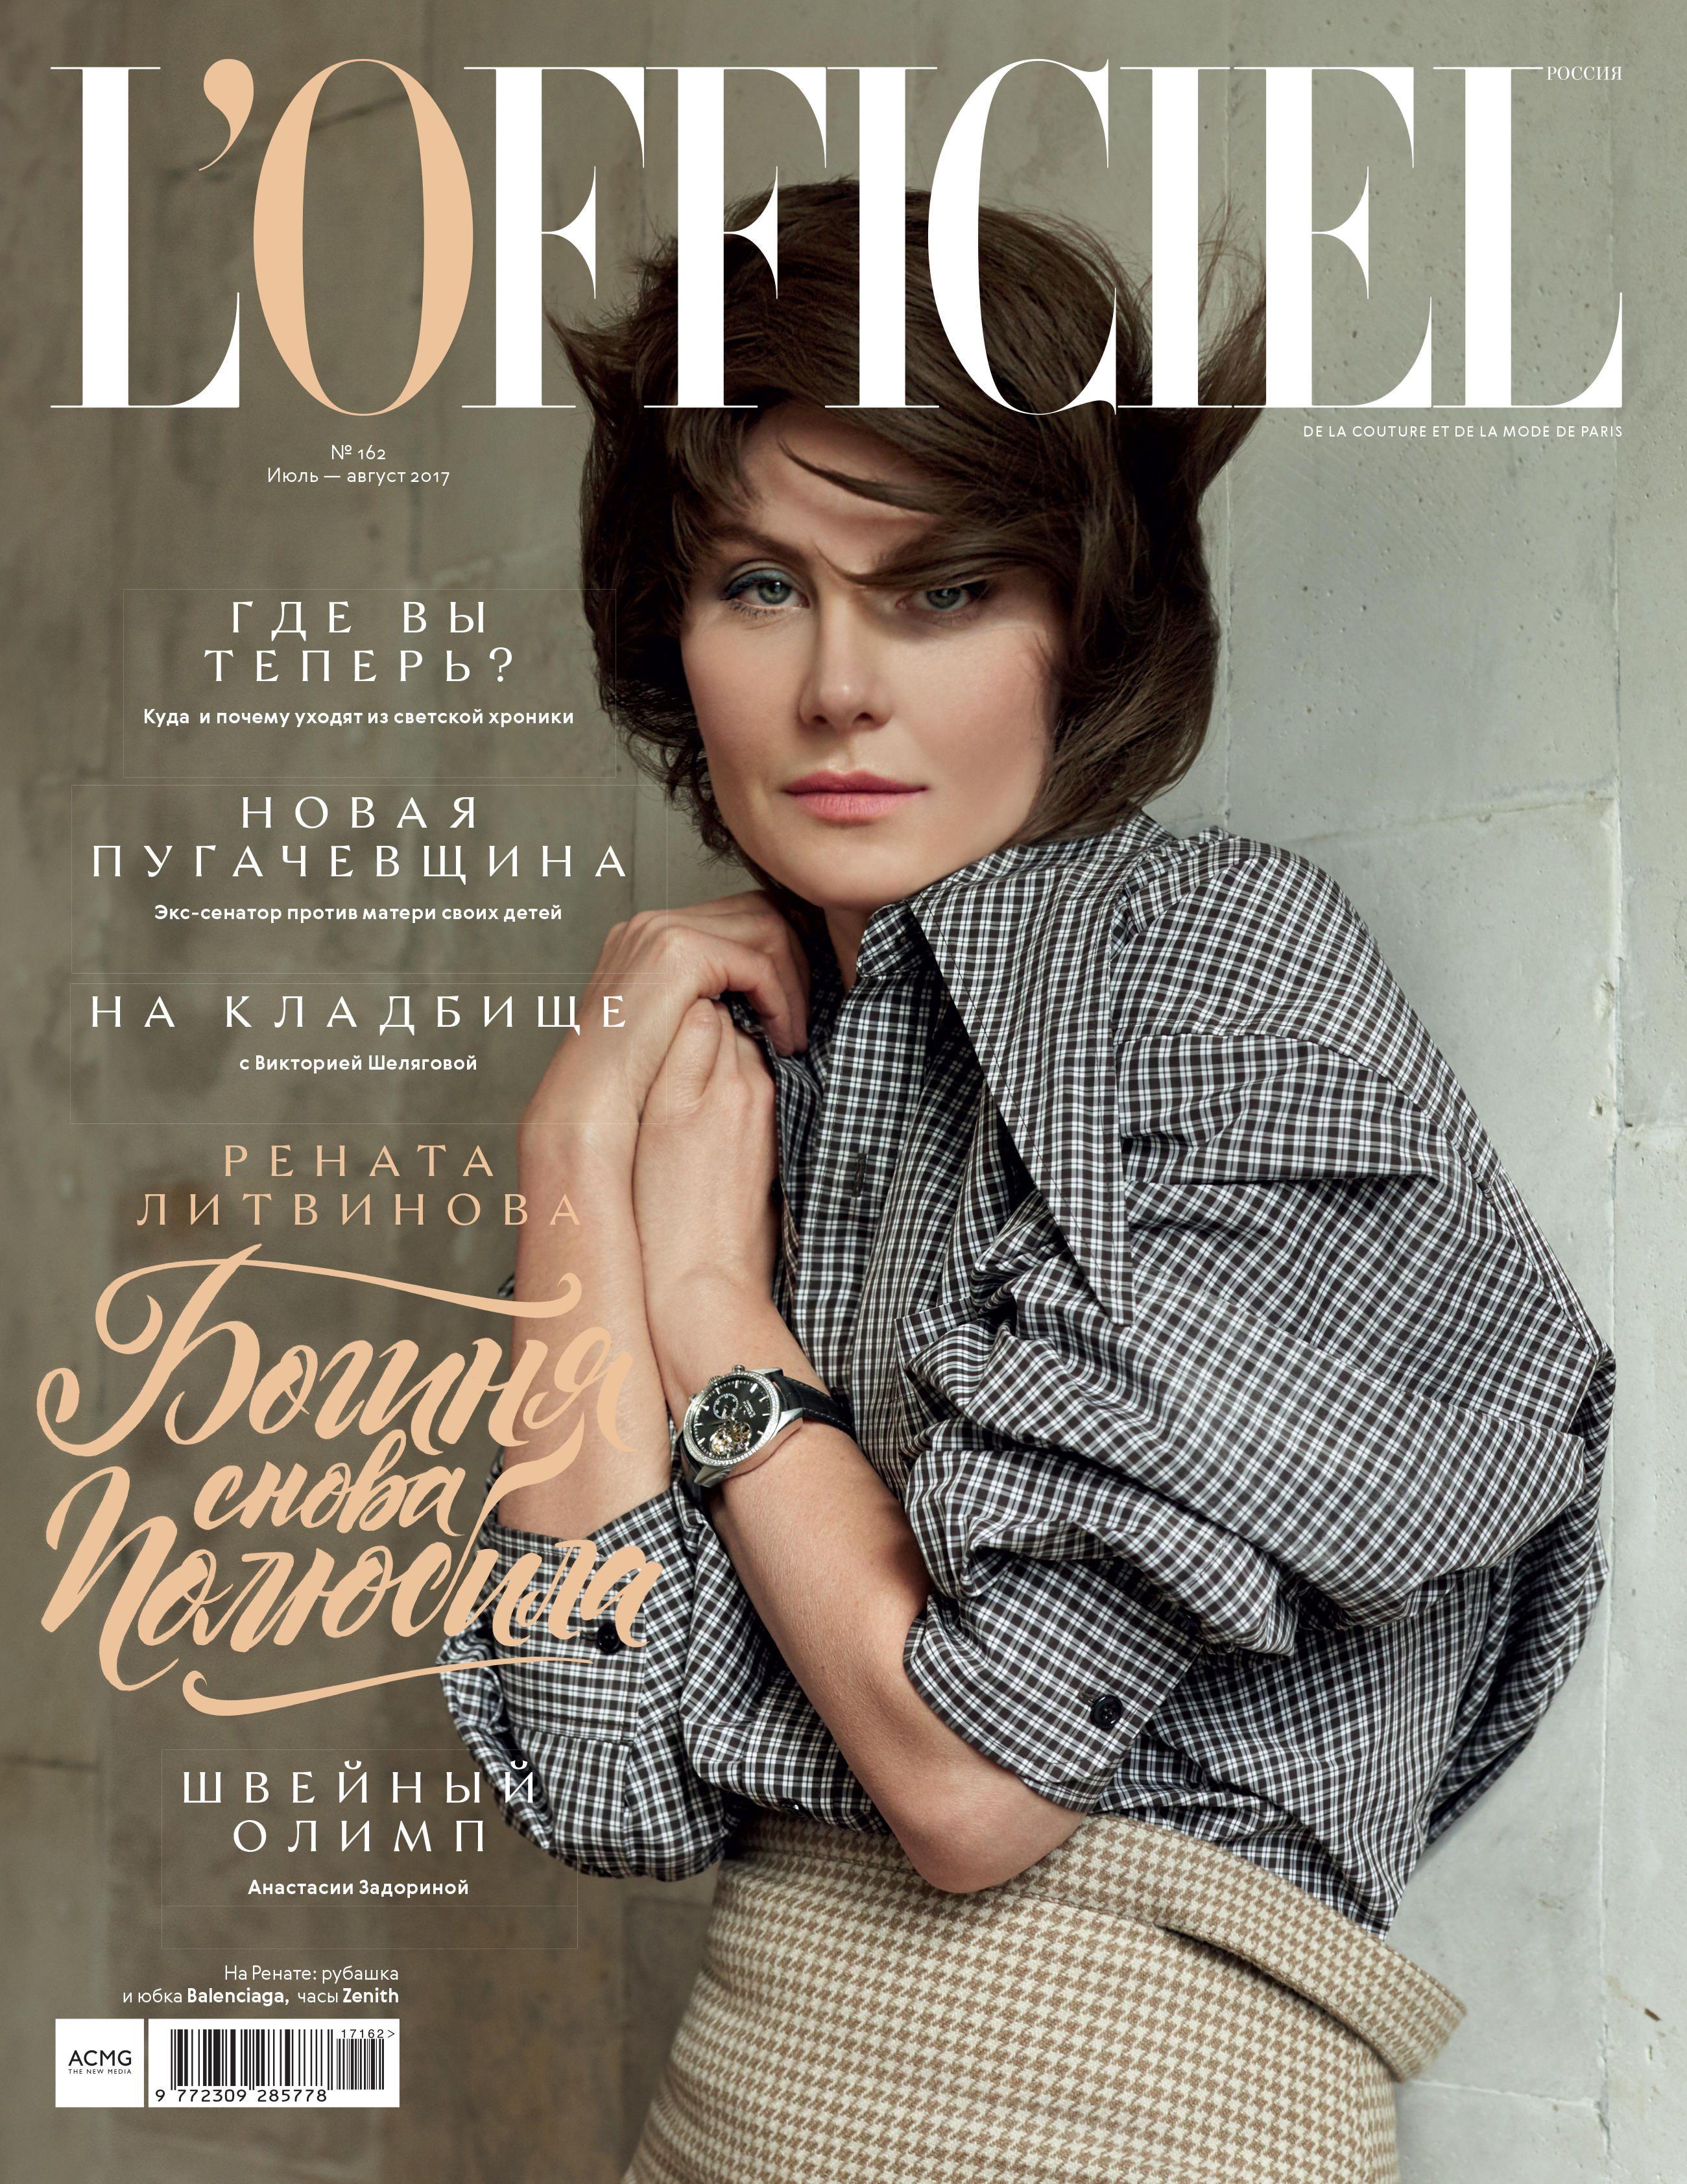 Renata Litvinova shot her daughter in a new film